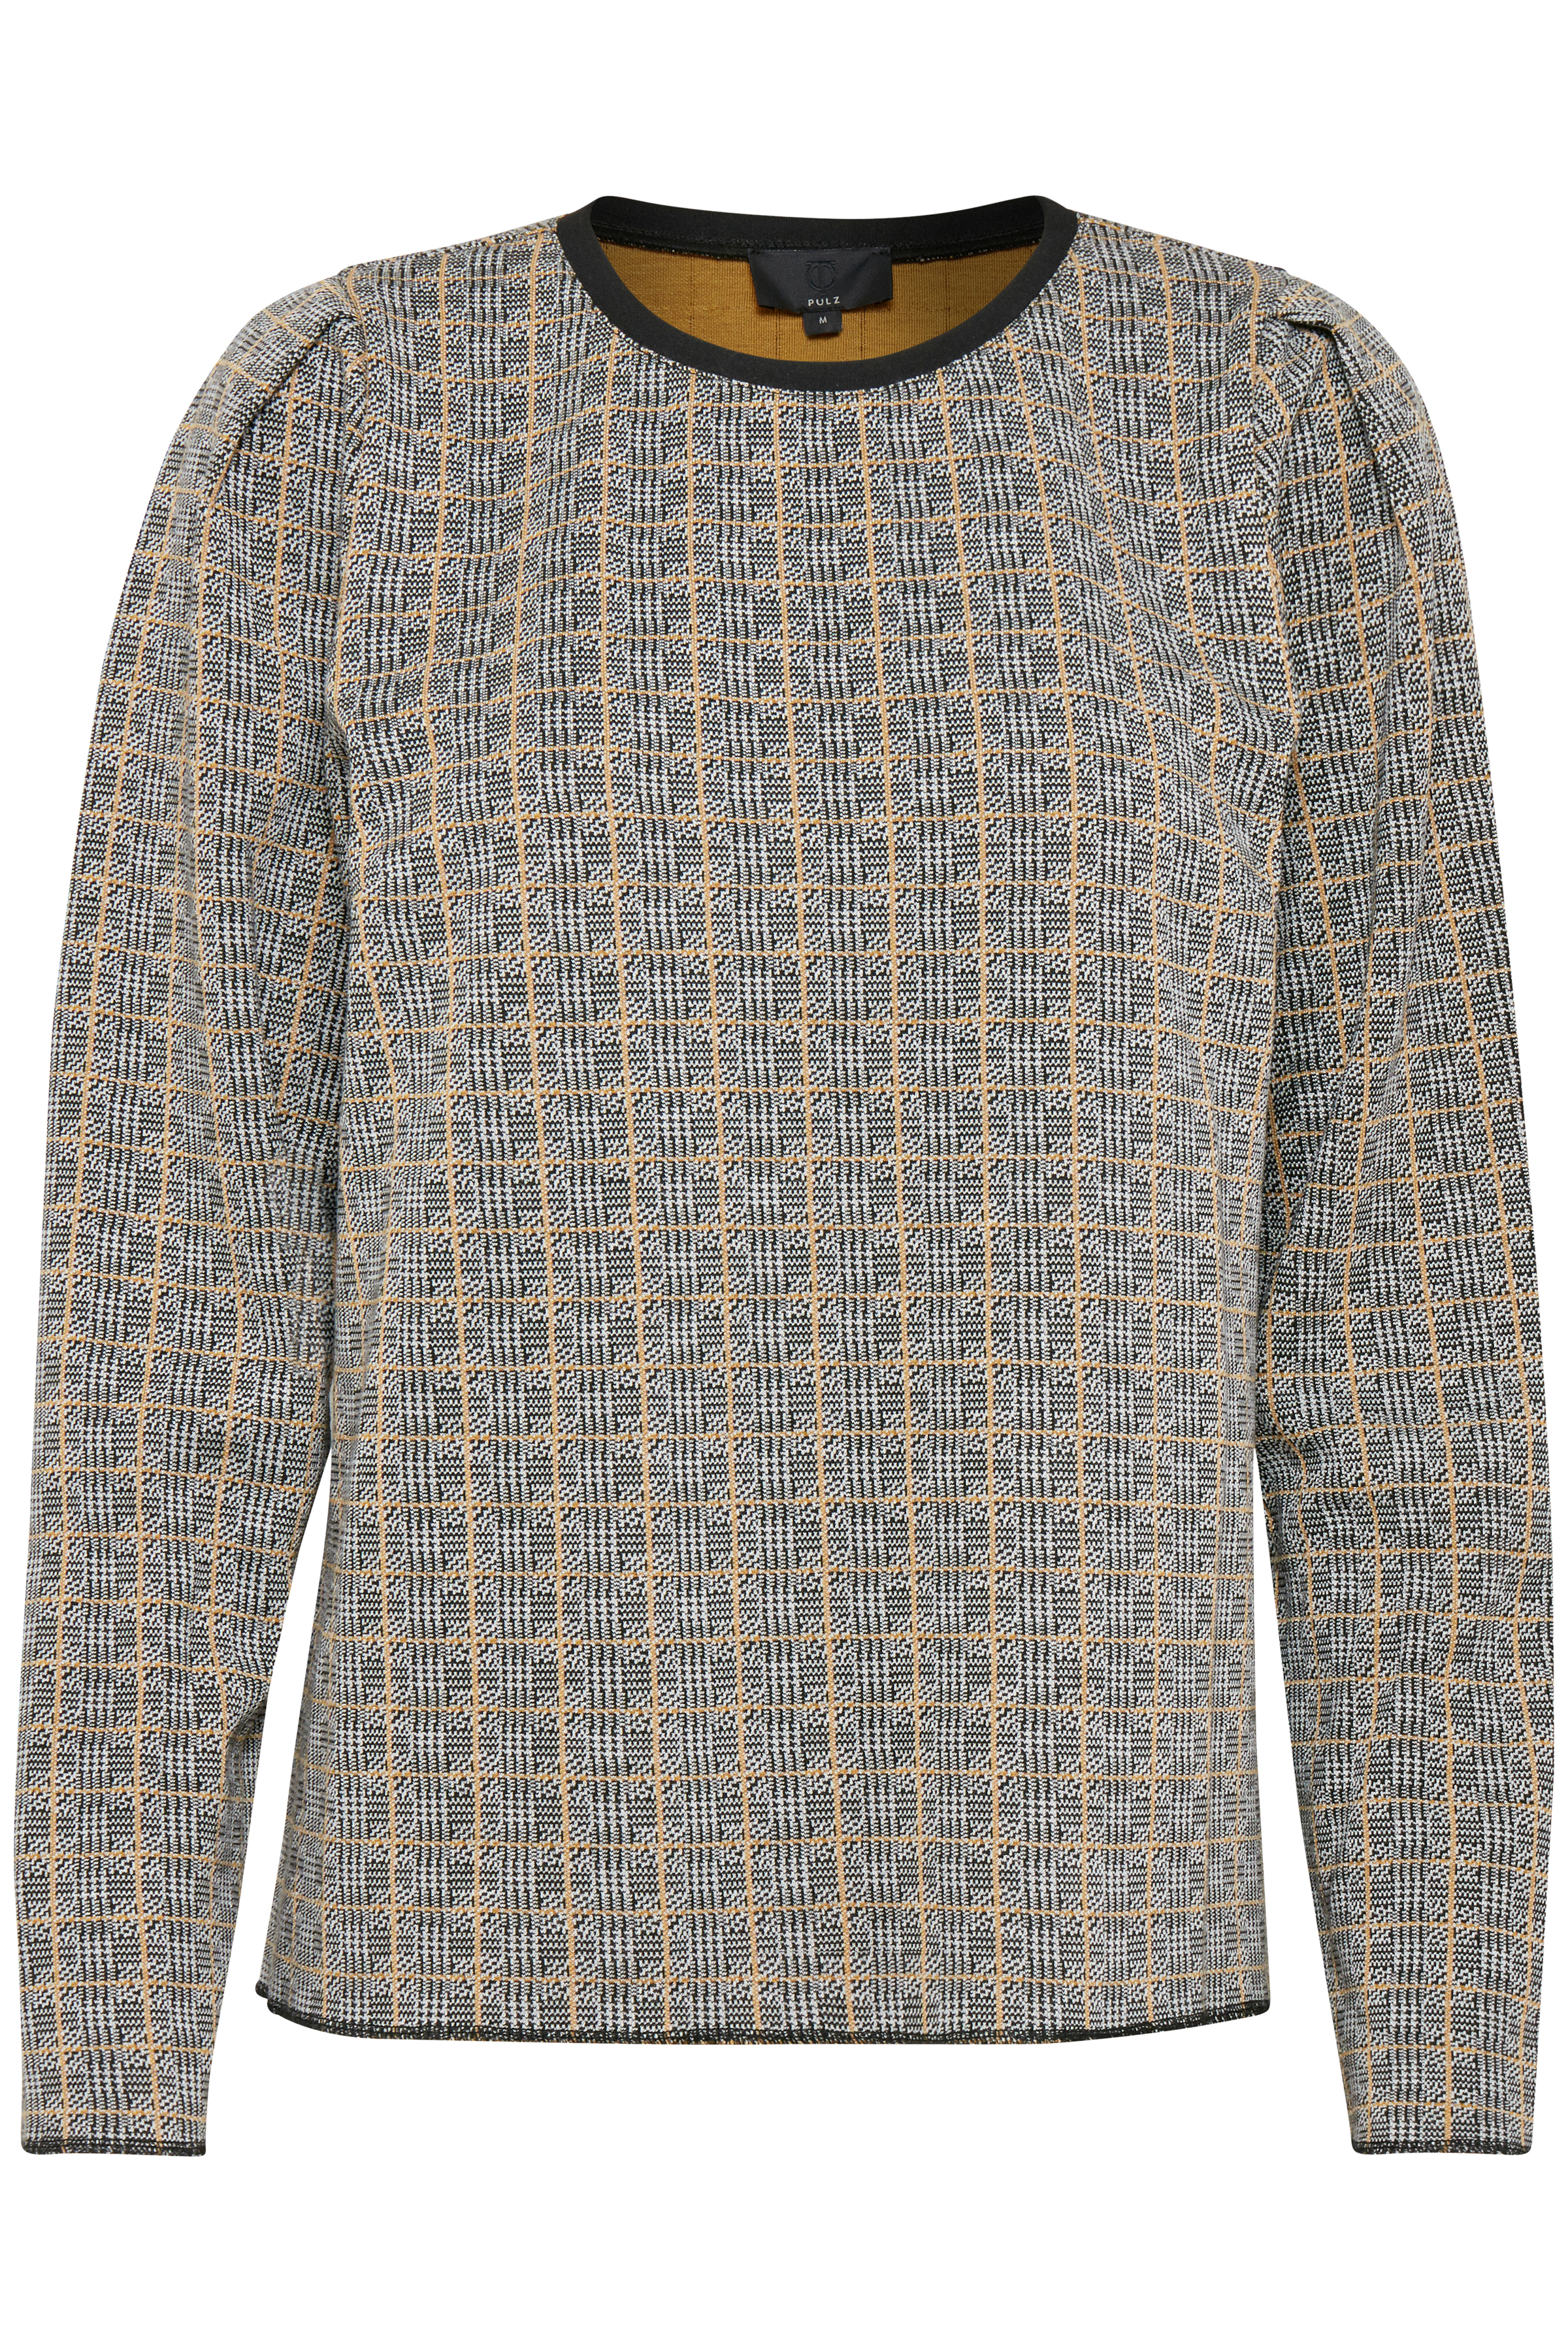 Pulz Jeans Dame Sweatshirt - Sort/off-white